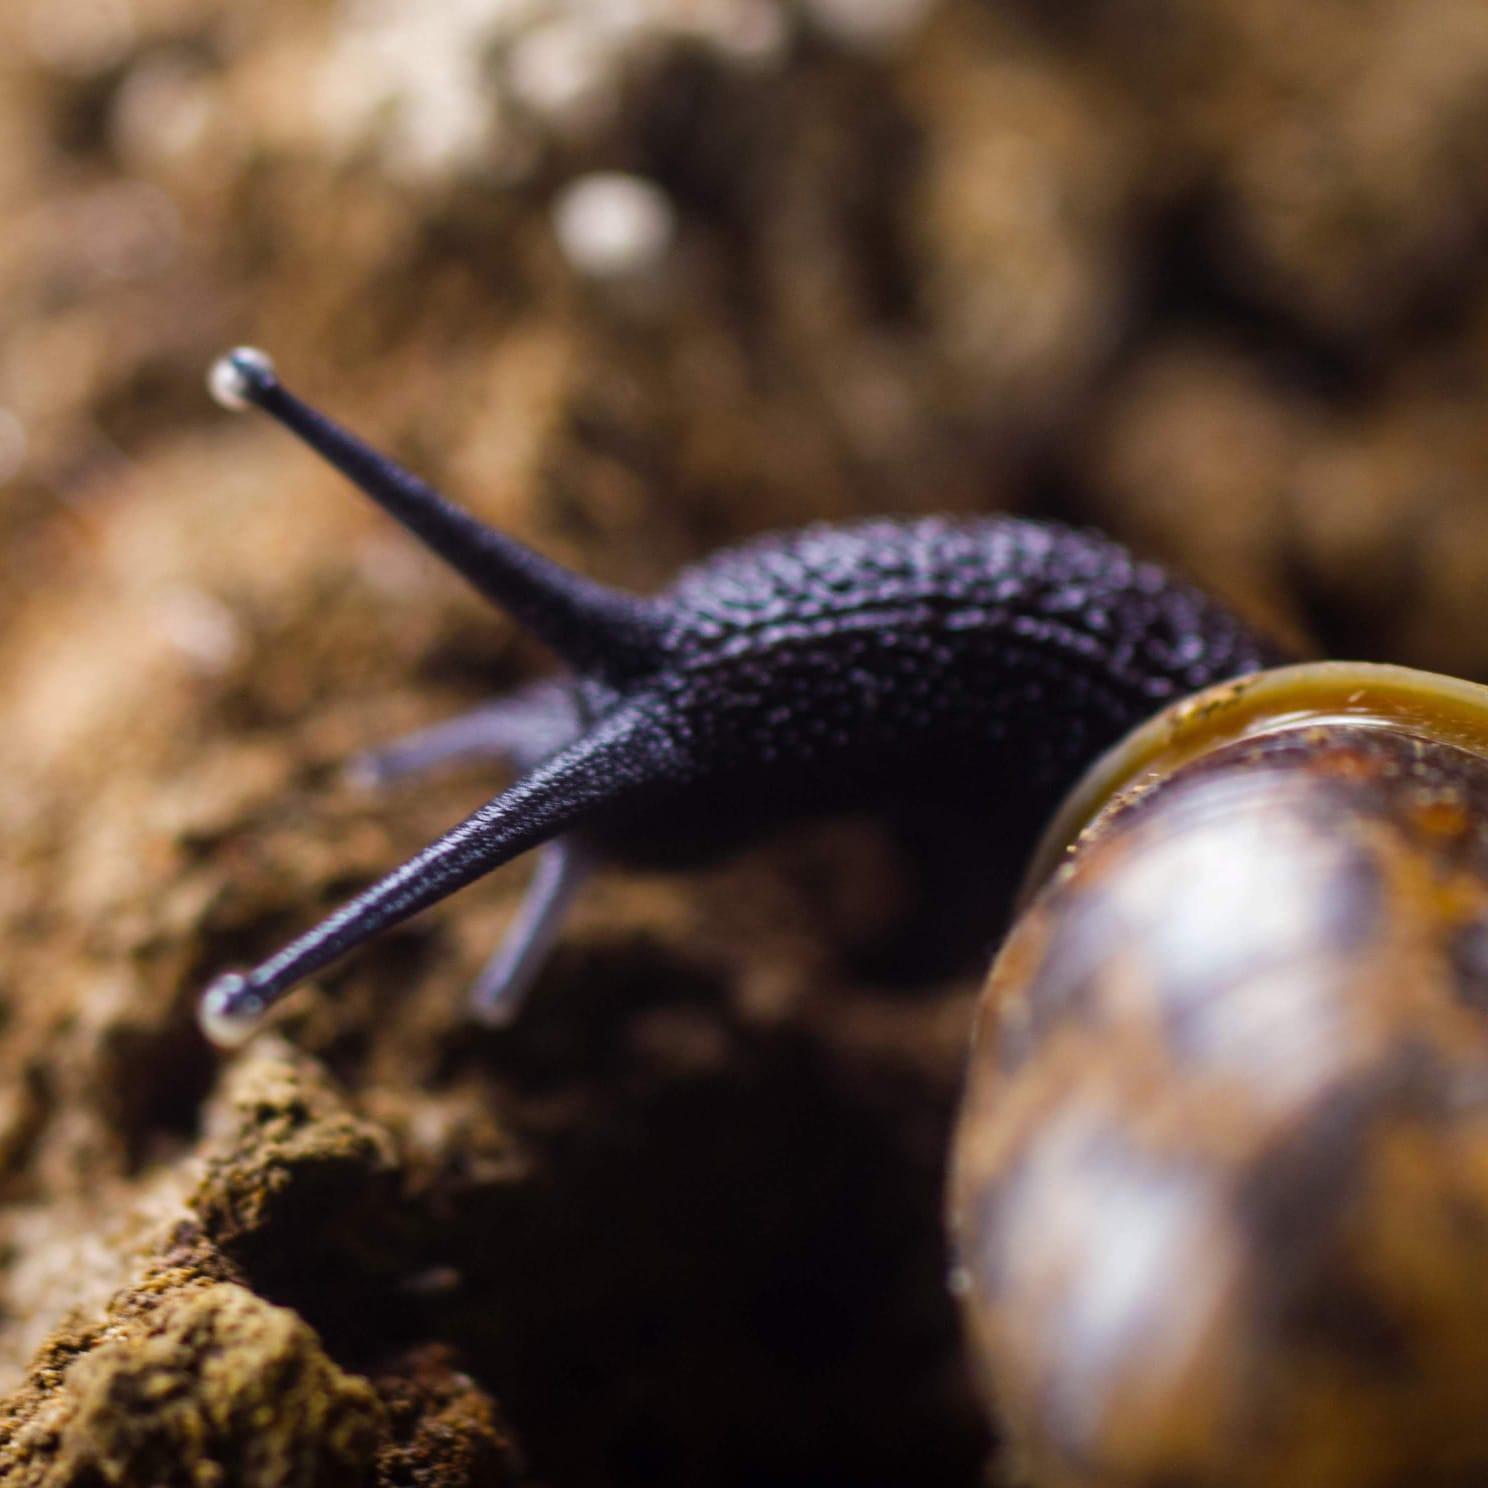 IMG 20201123 WA0002 - Akerbeltz pide ayuda para indagar en la rica biología subterránea de Gipuzkoa